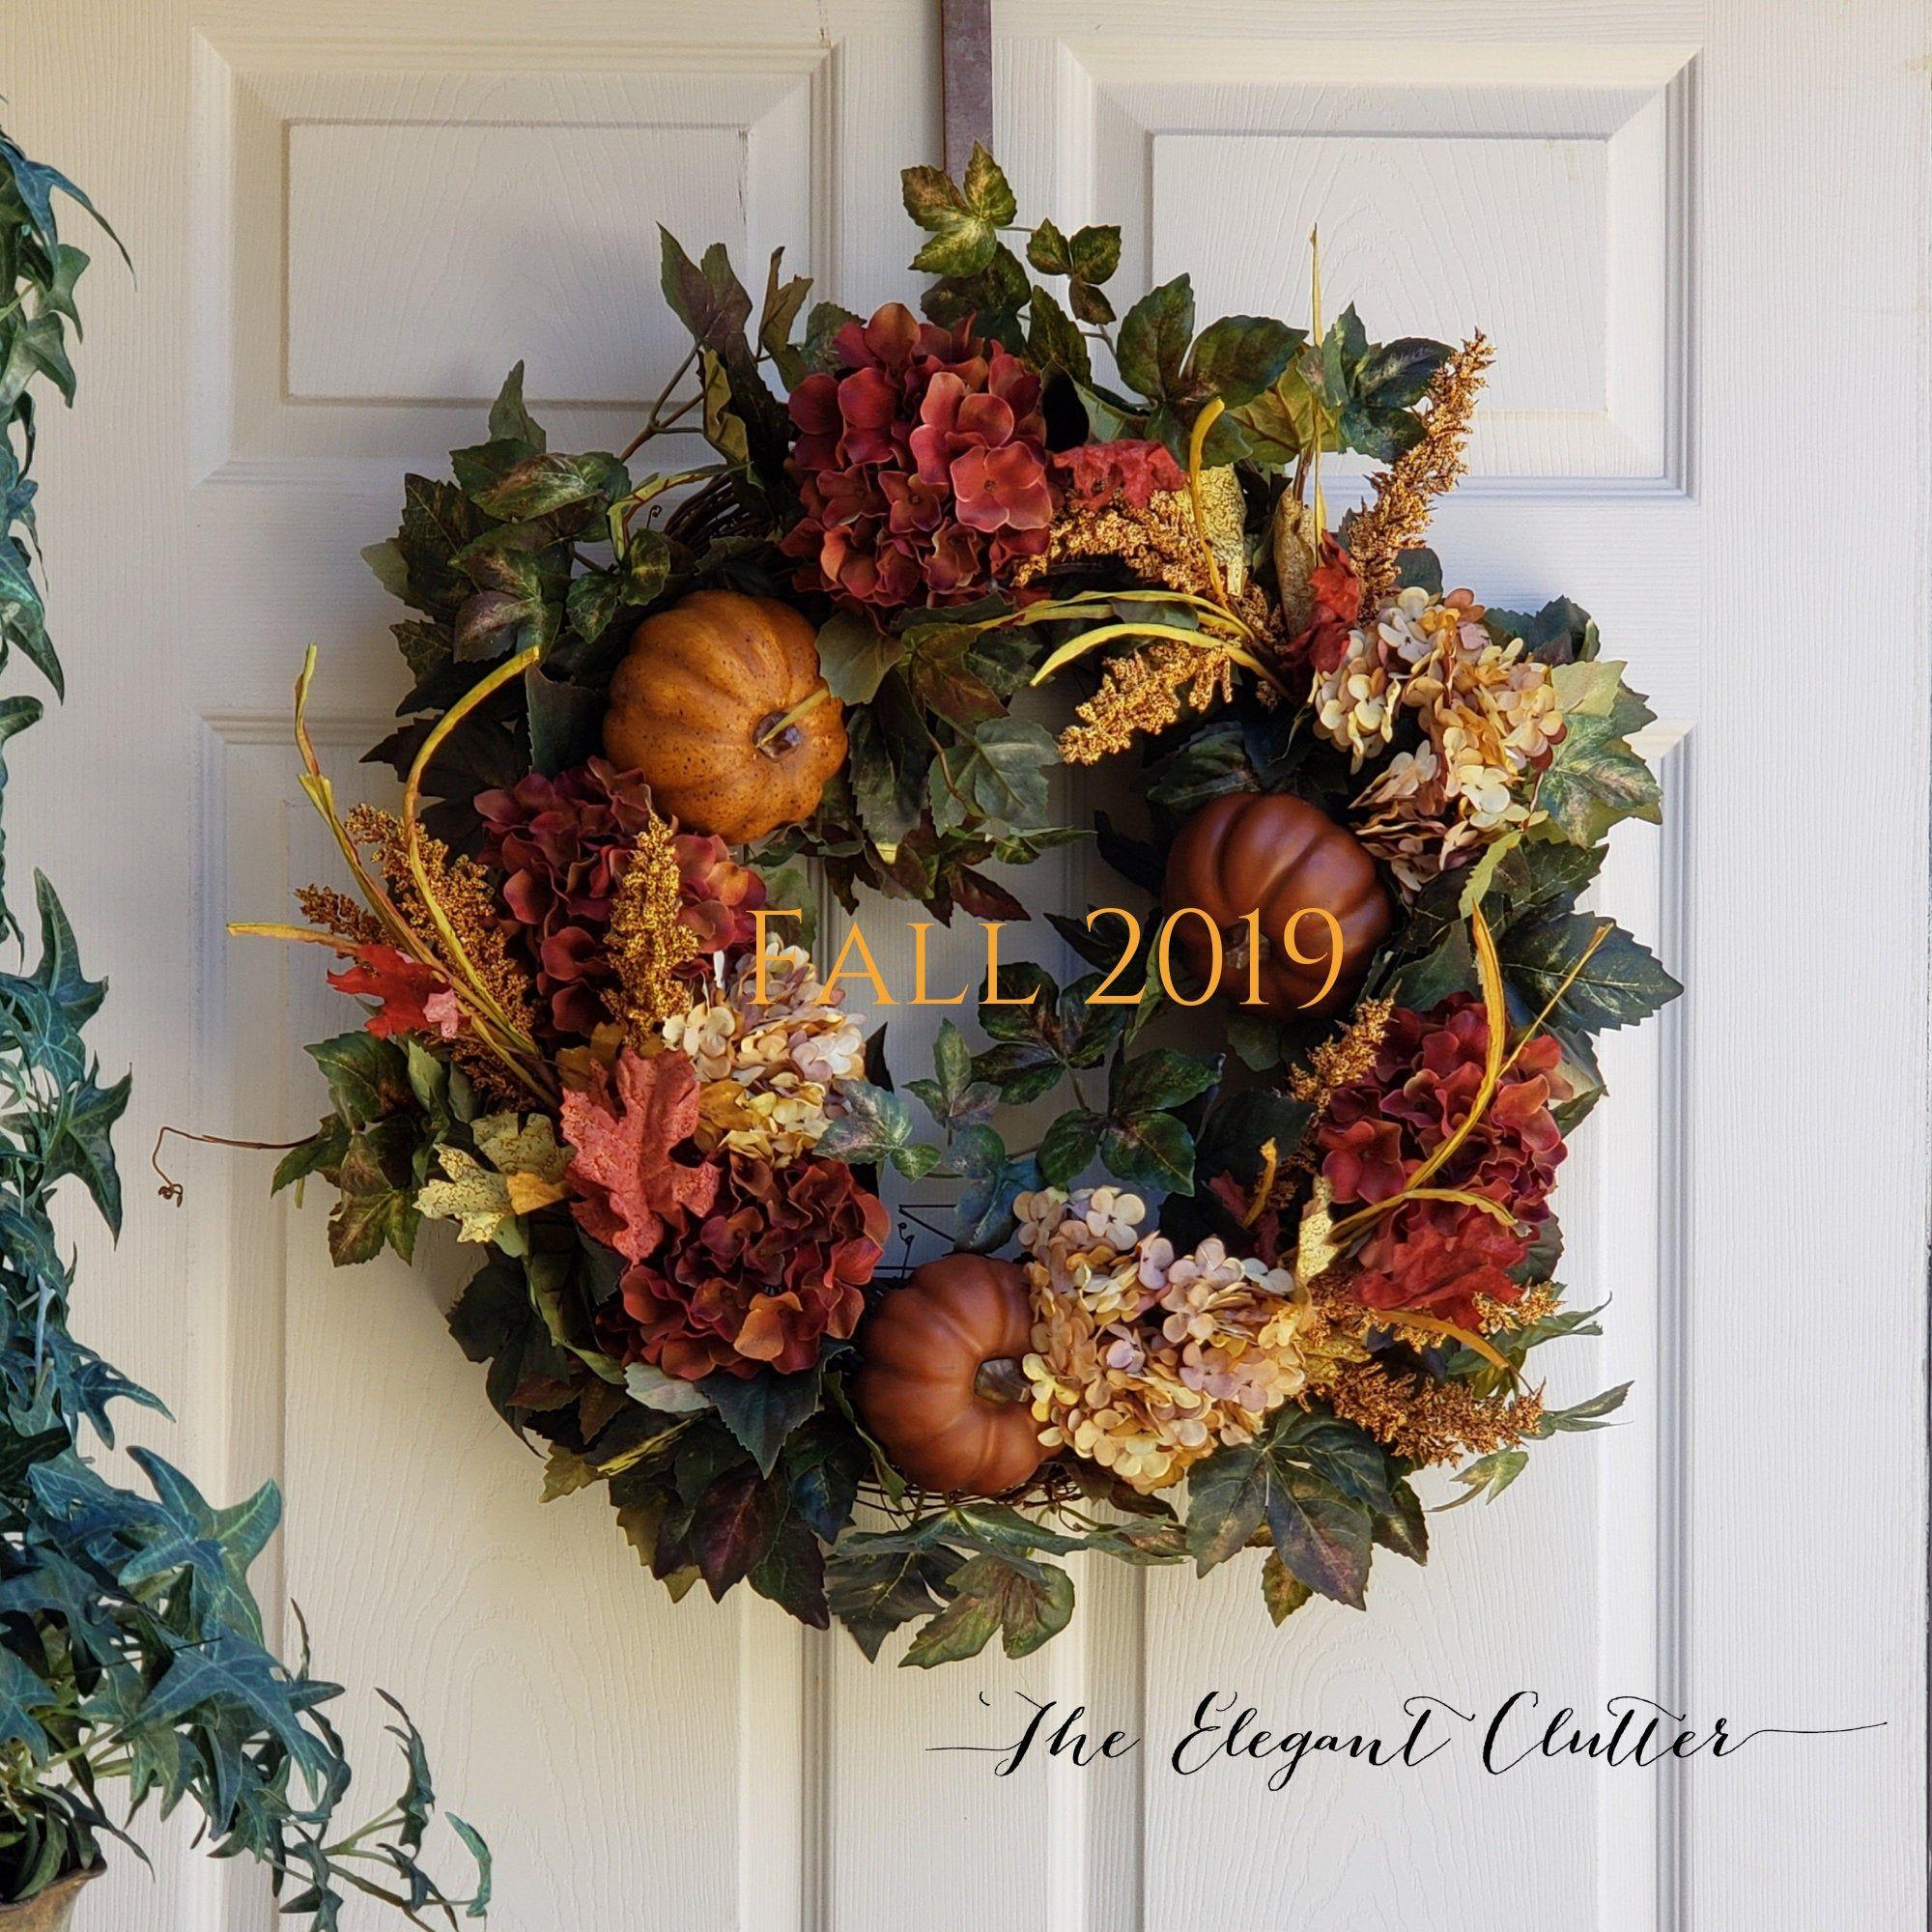 FALL WREATHS| AUTUMN Harvest Door Wreath | Pumpkin Wreath|Thanksgiving Door Wreath|Wreaths For Front Doors|Fall Hydrangea Wreath #fallwreaths